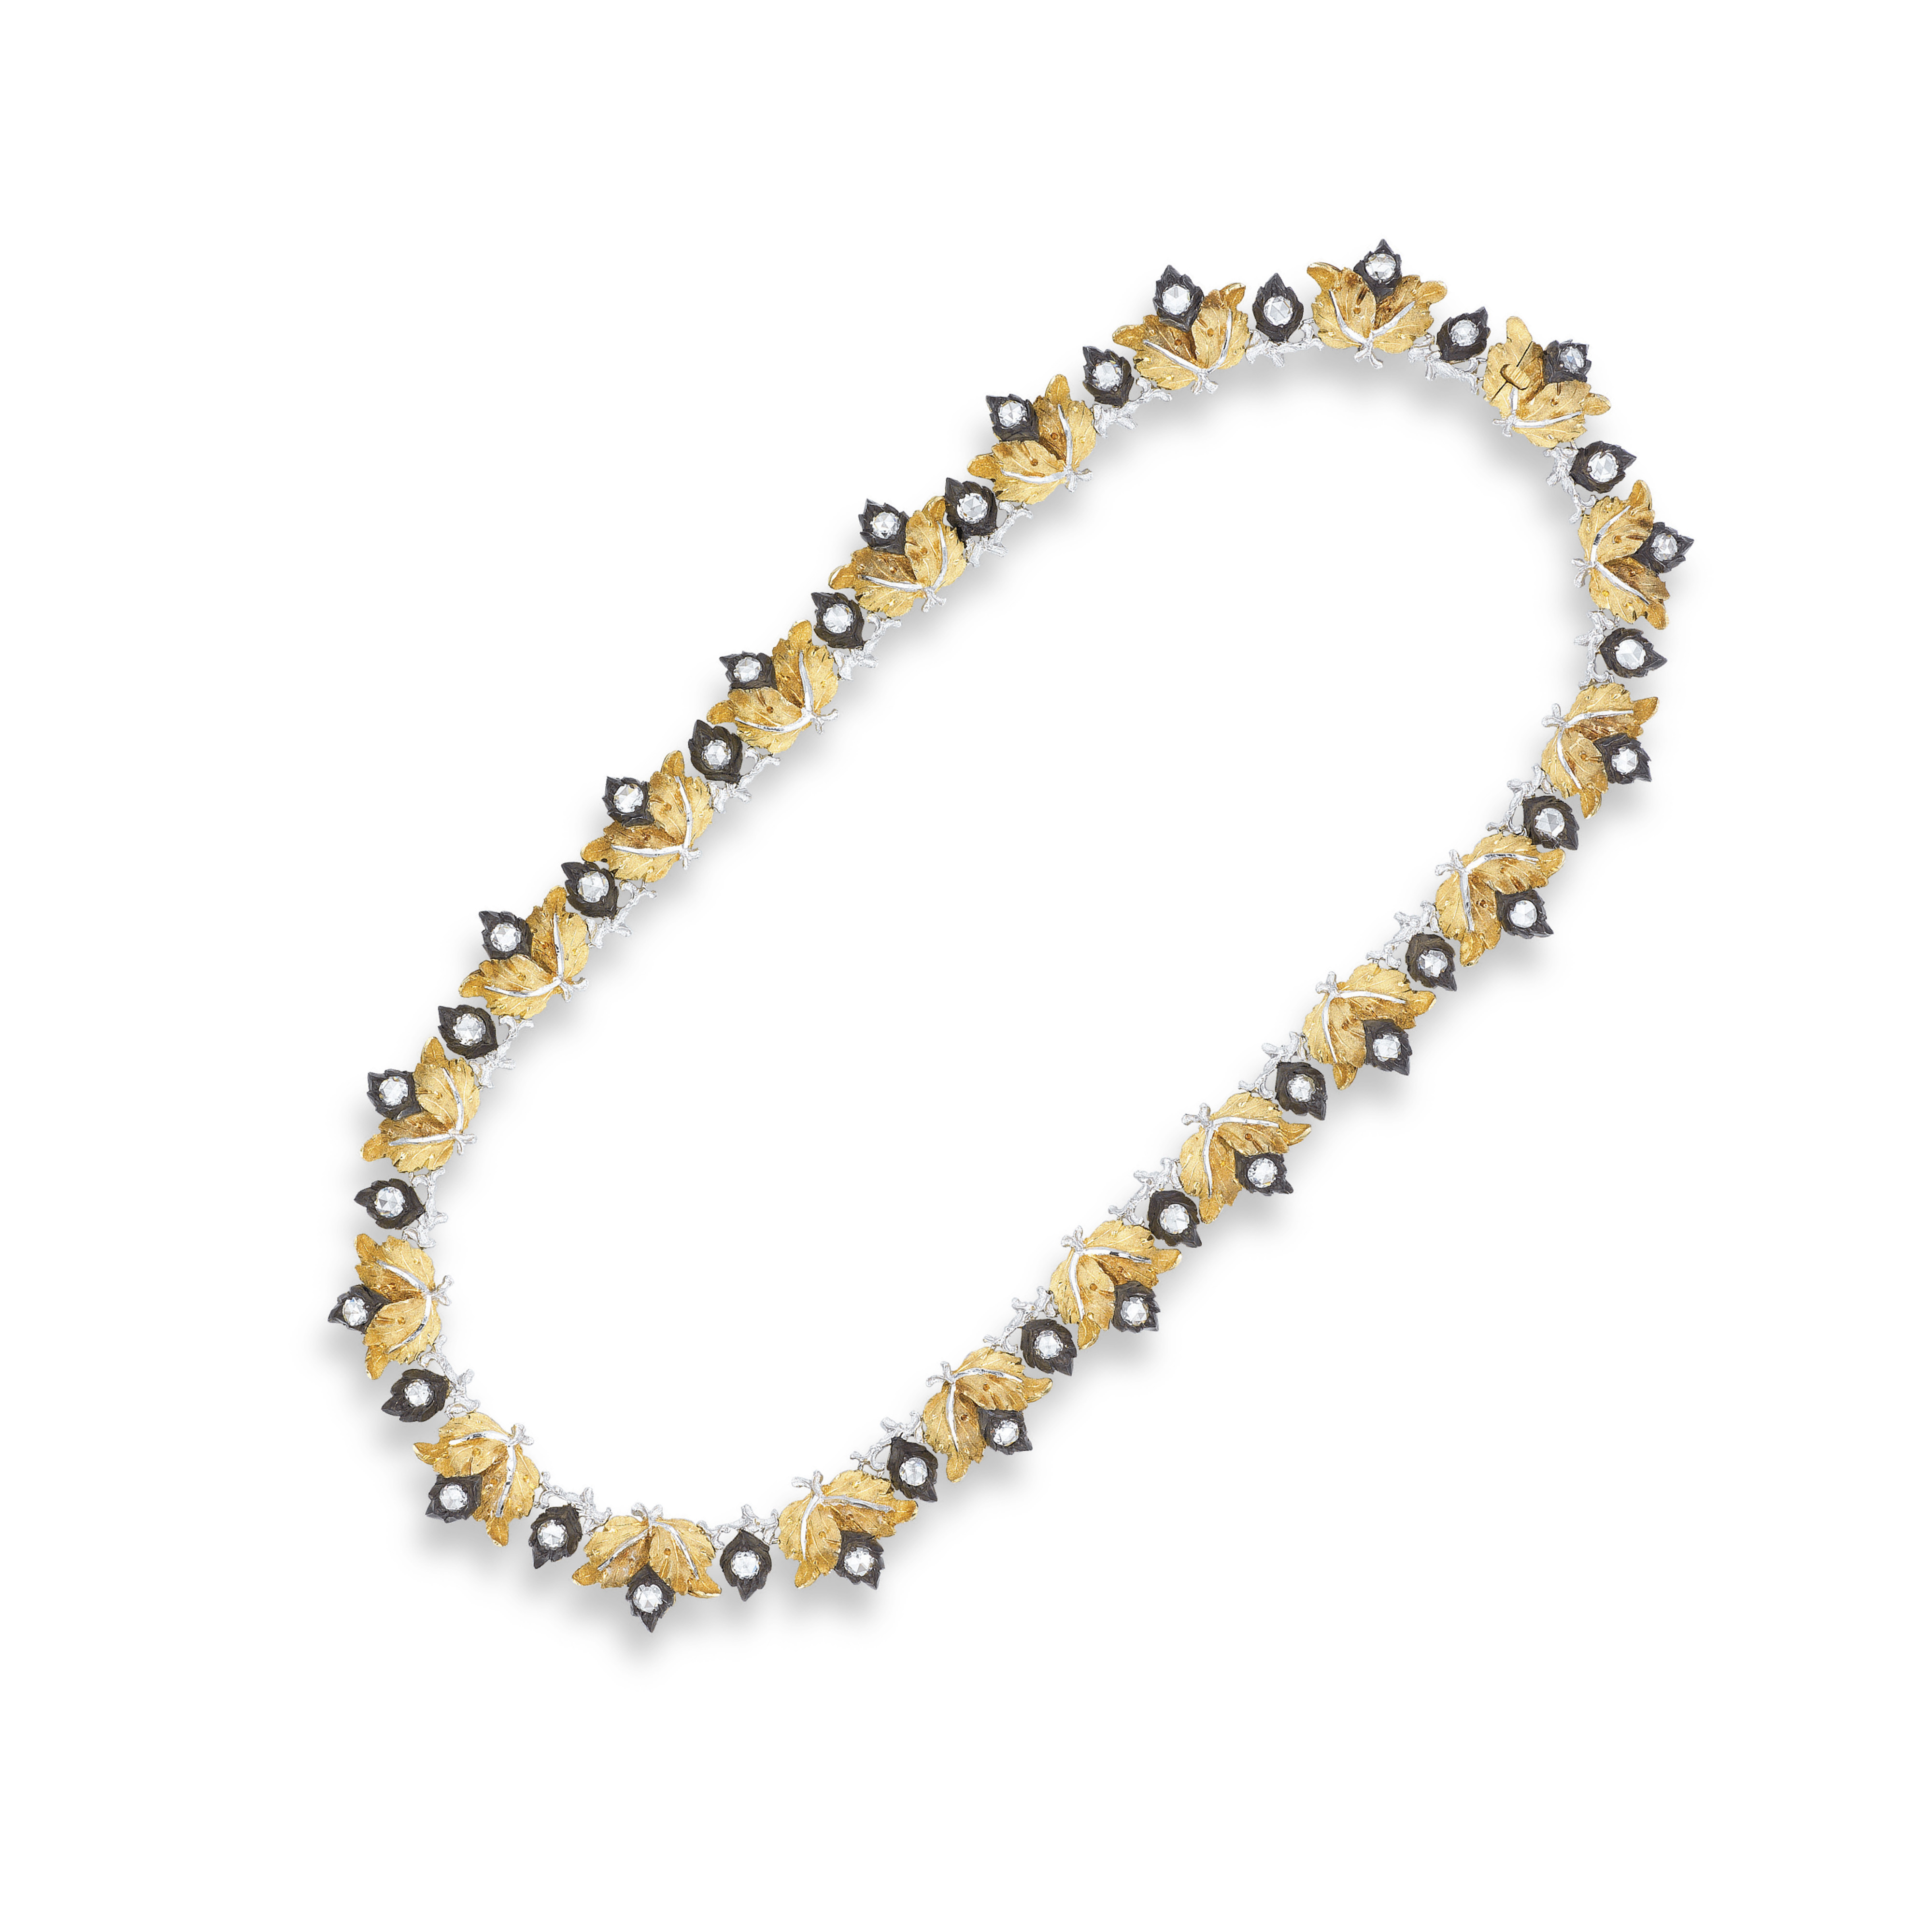 A DIAMOND NECKLACE, BY BUCCELLATI